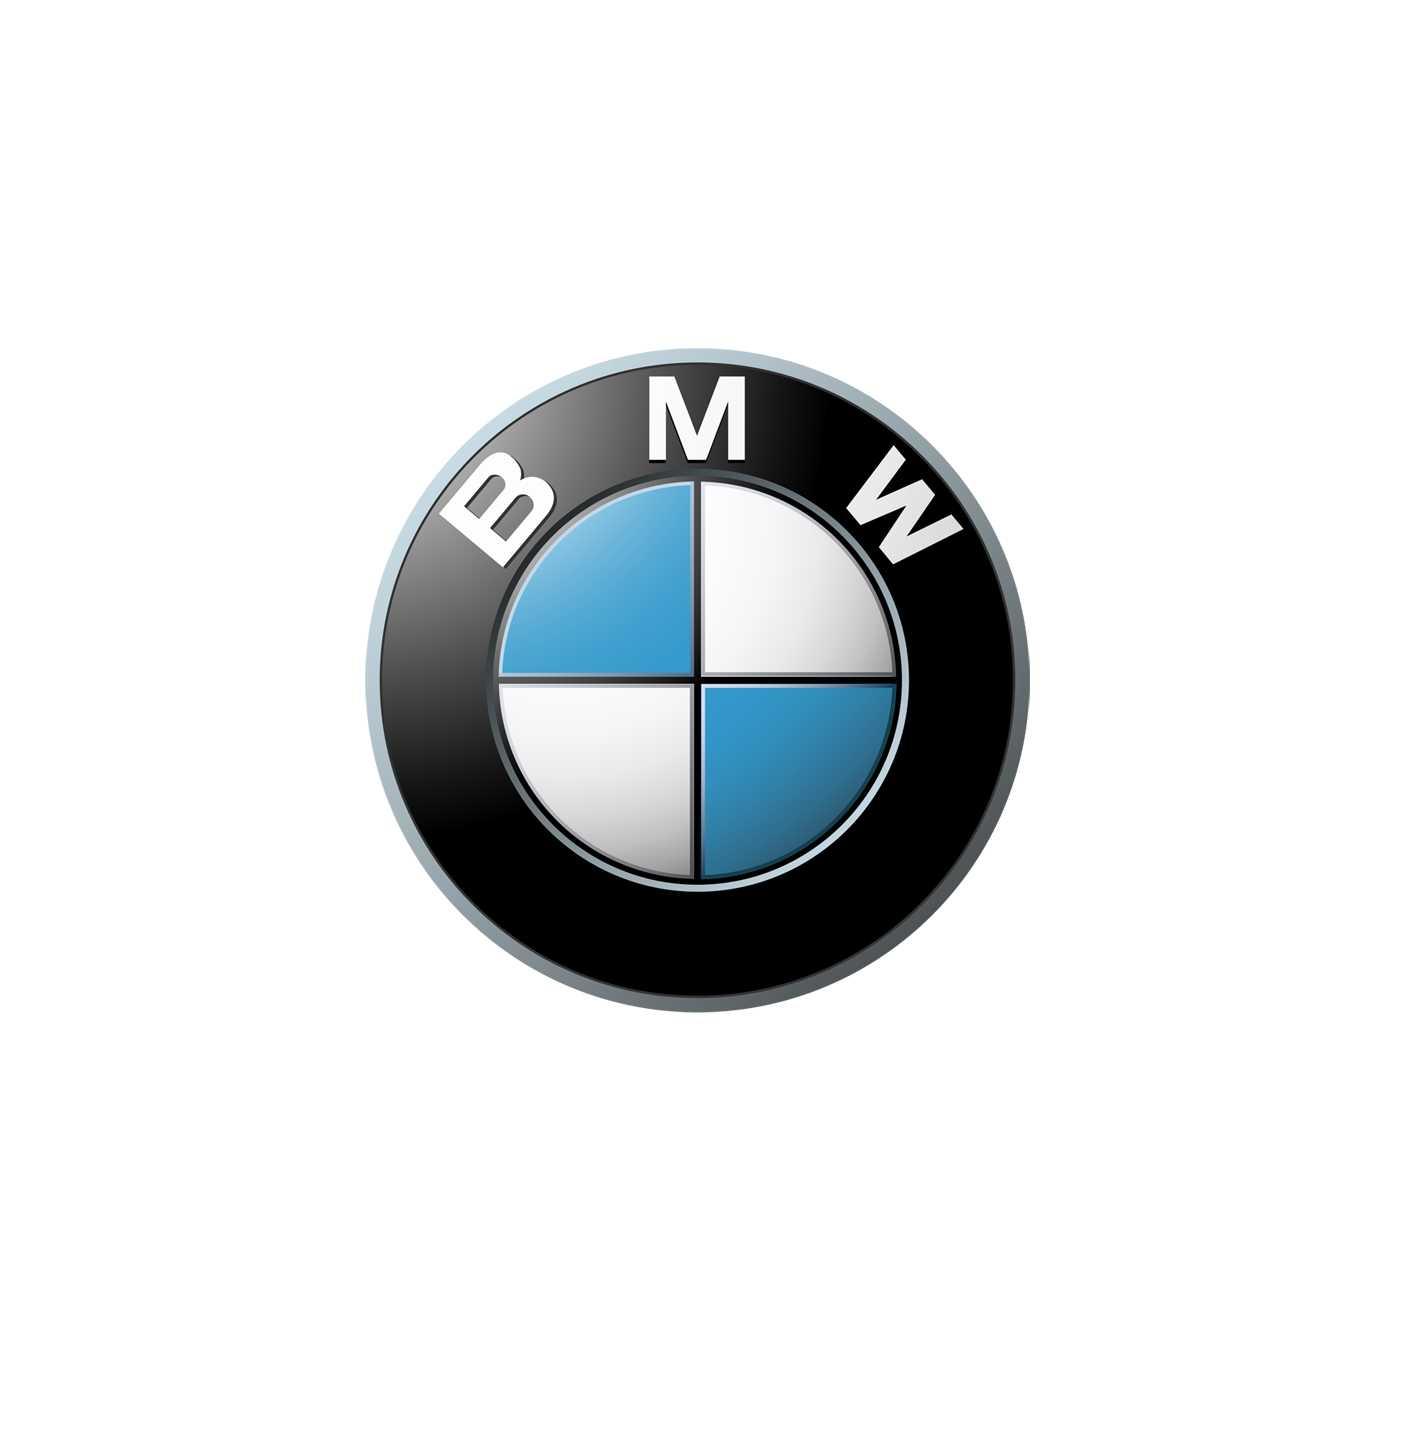 BMW good.jpg